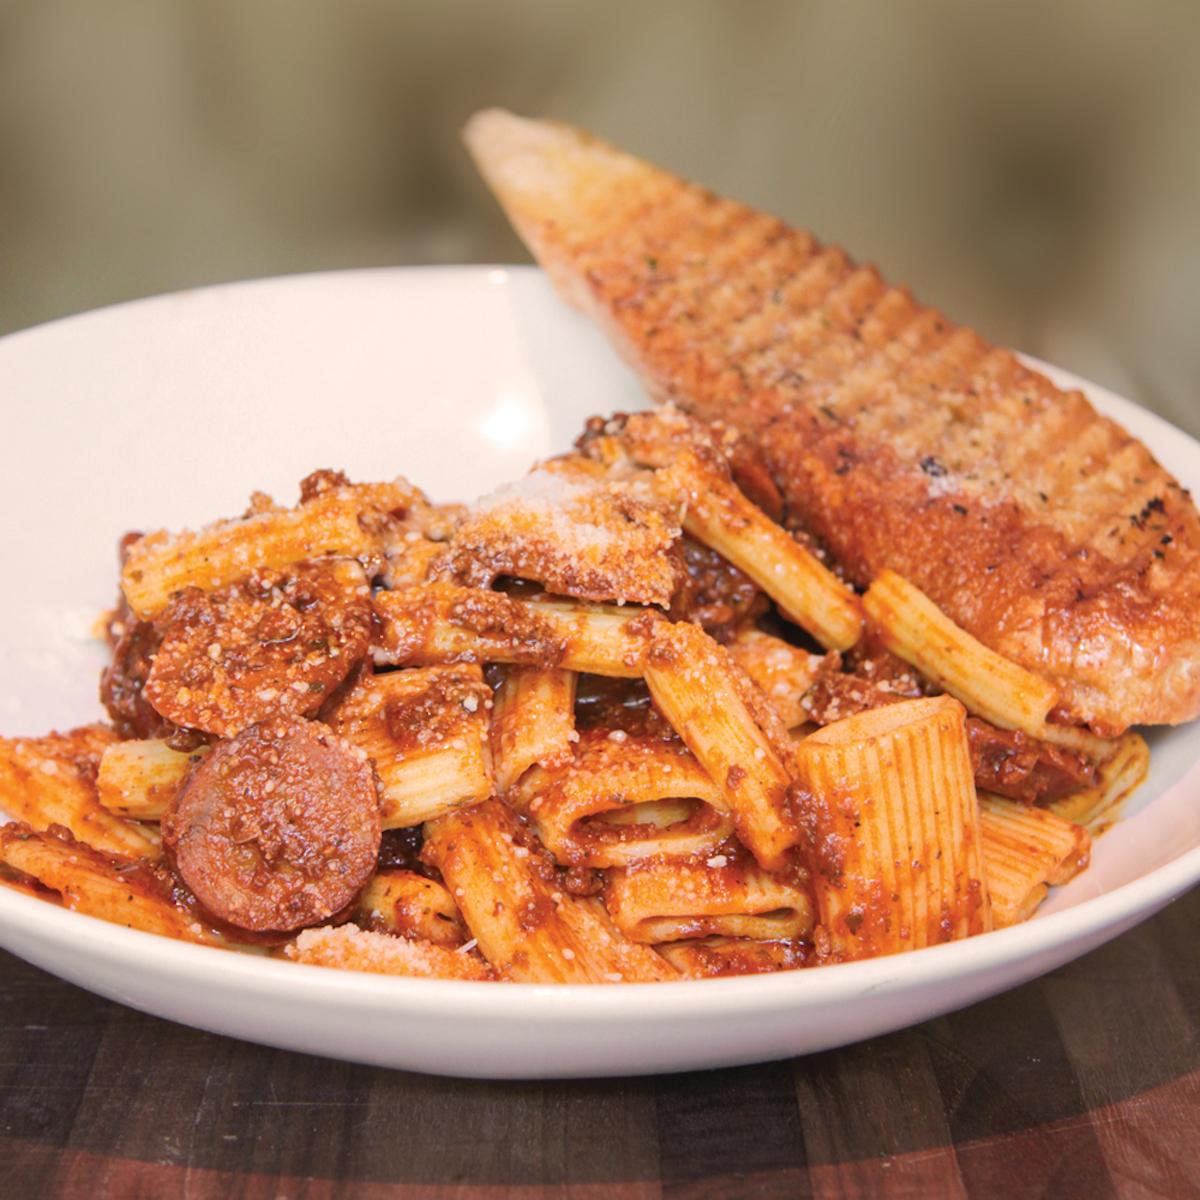 Famoso Italian Pizzeria + Bar rolls out their new 'More Italiano' menu featuring Authentico Pomodoro Sauce